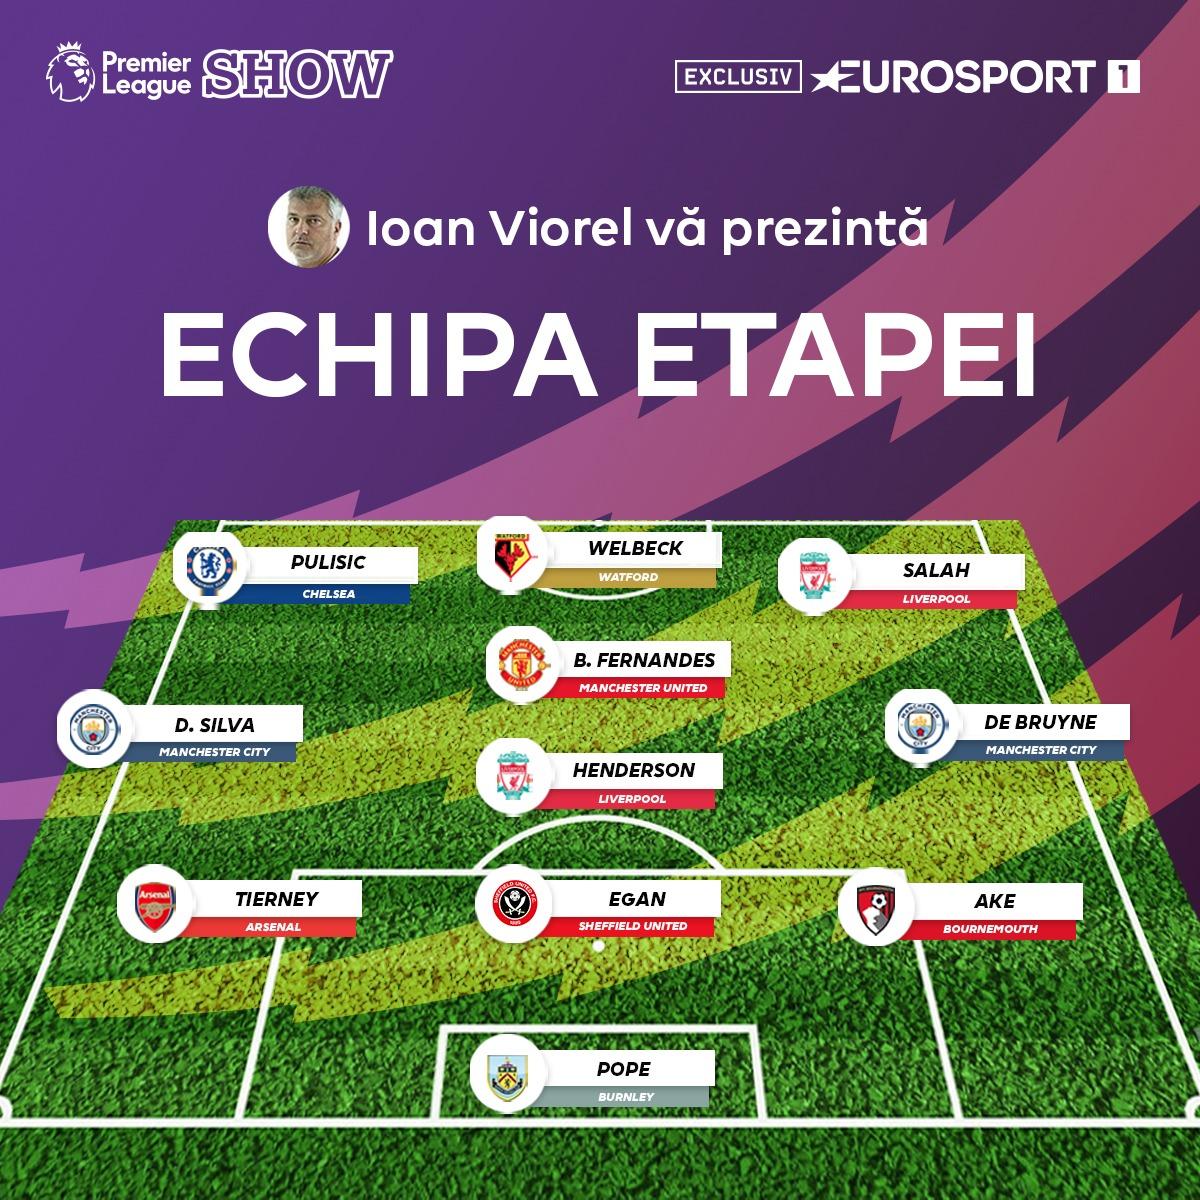 https://i.eurosport.com/2020/07/10/2847840.png